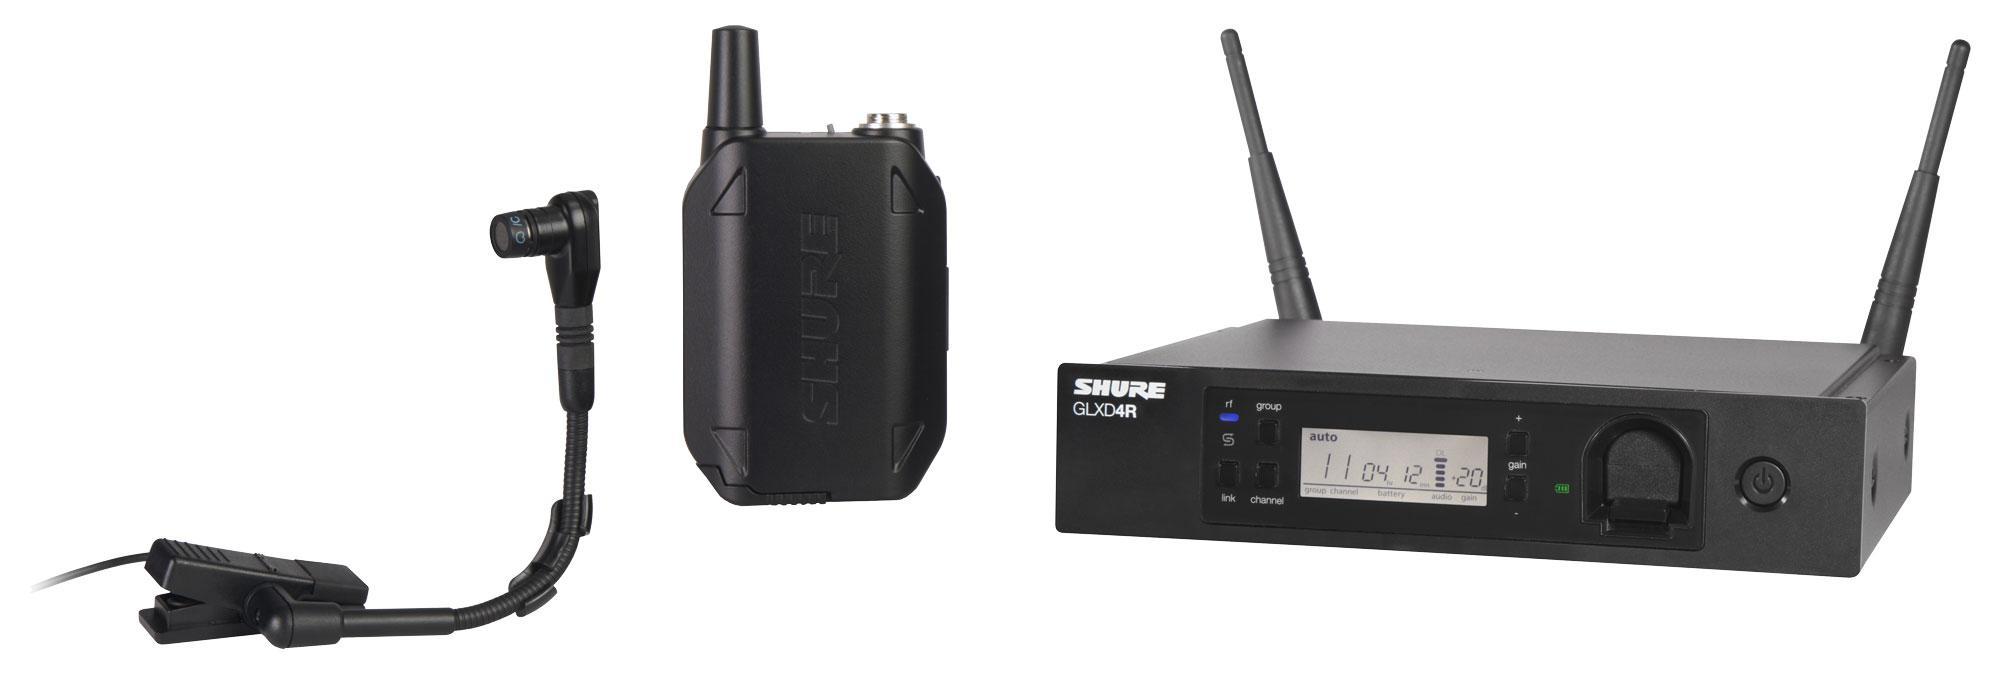 Drahtlossysteme - Shure GLXD14R|BETA98H Digitales Funksystem mit Beta 98H Clip On Mikrofon - Onlineshop Musikhaus Kirstein